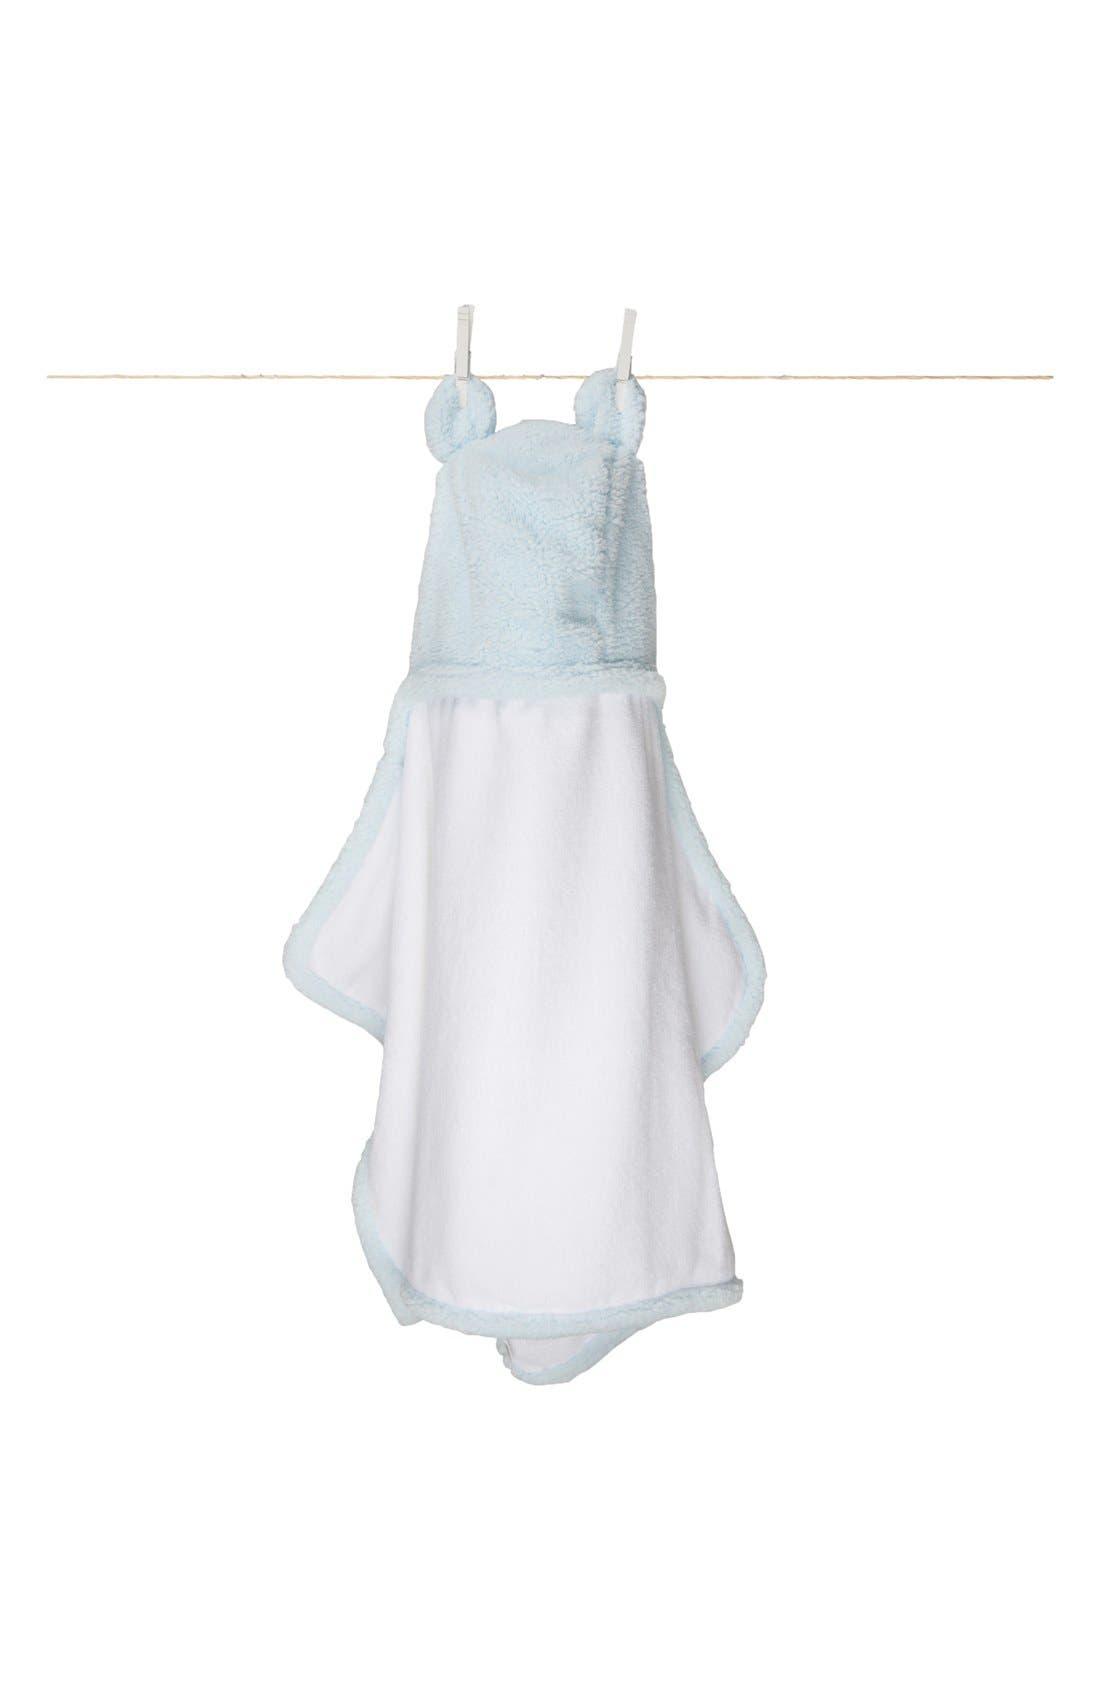 LITTLE GIRAFFE 'Bella<sup>™</sup>' Towel, Main, color, 450